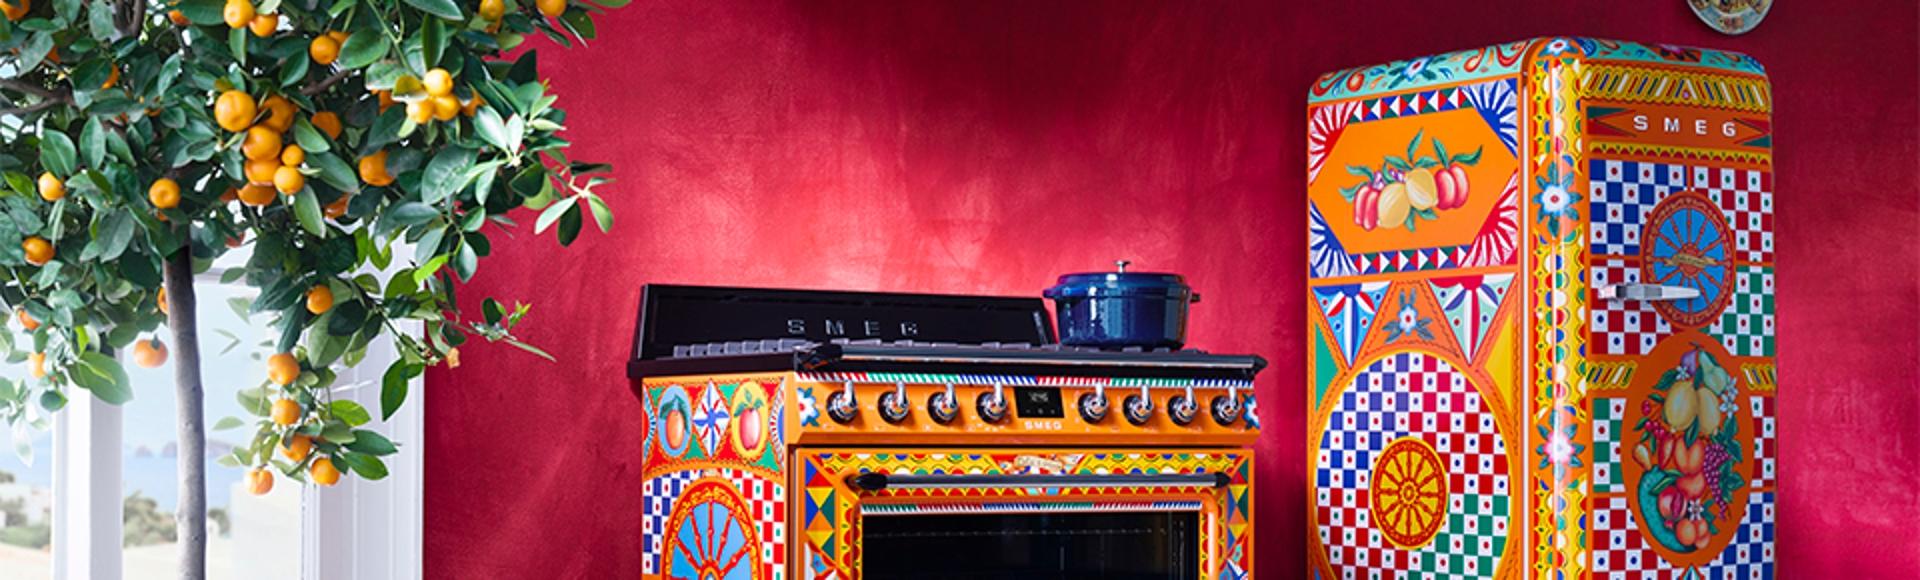 Divina Cucina - Smeg and Dolce&Gabbana